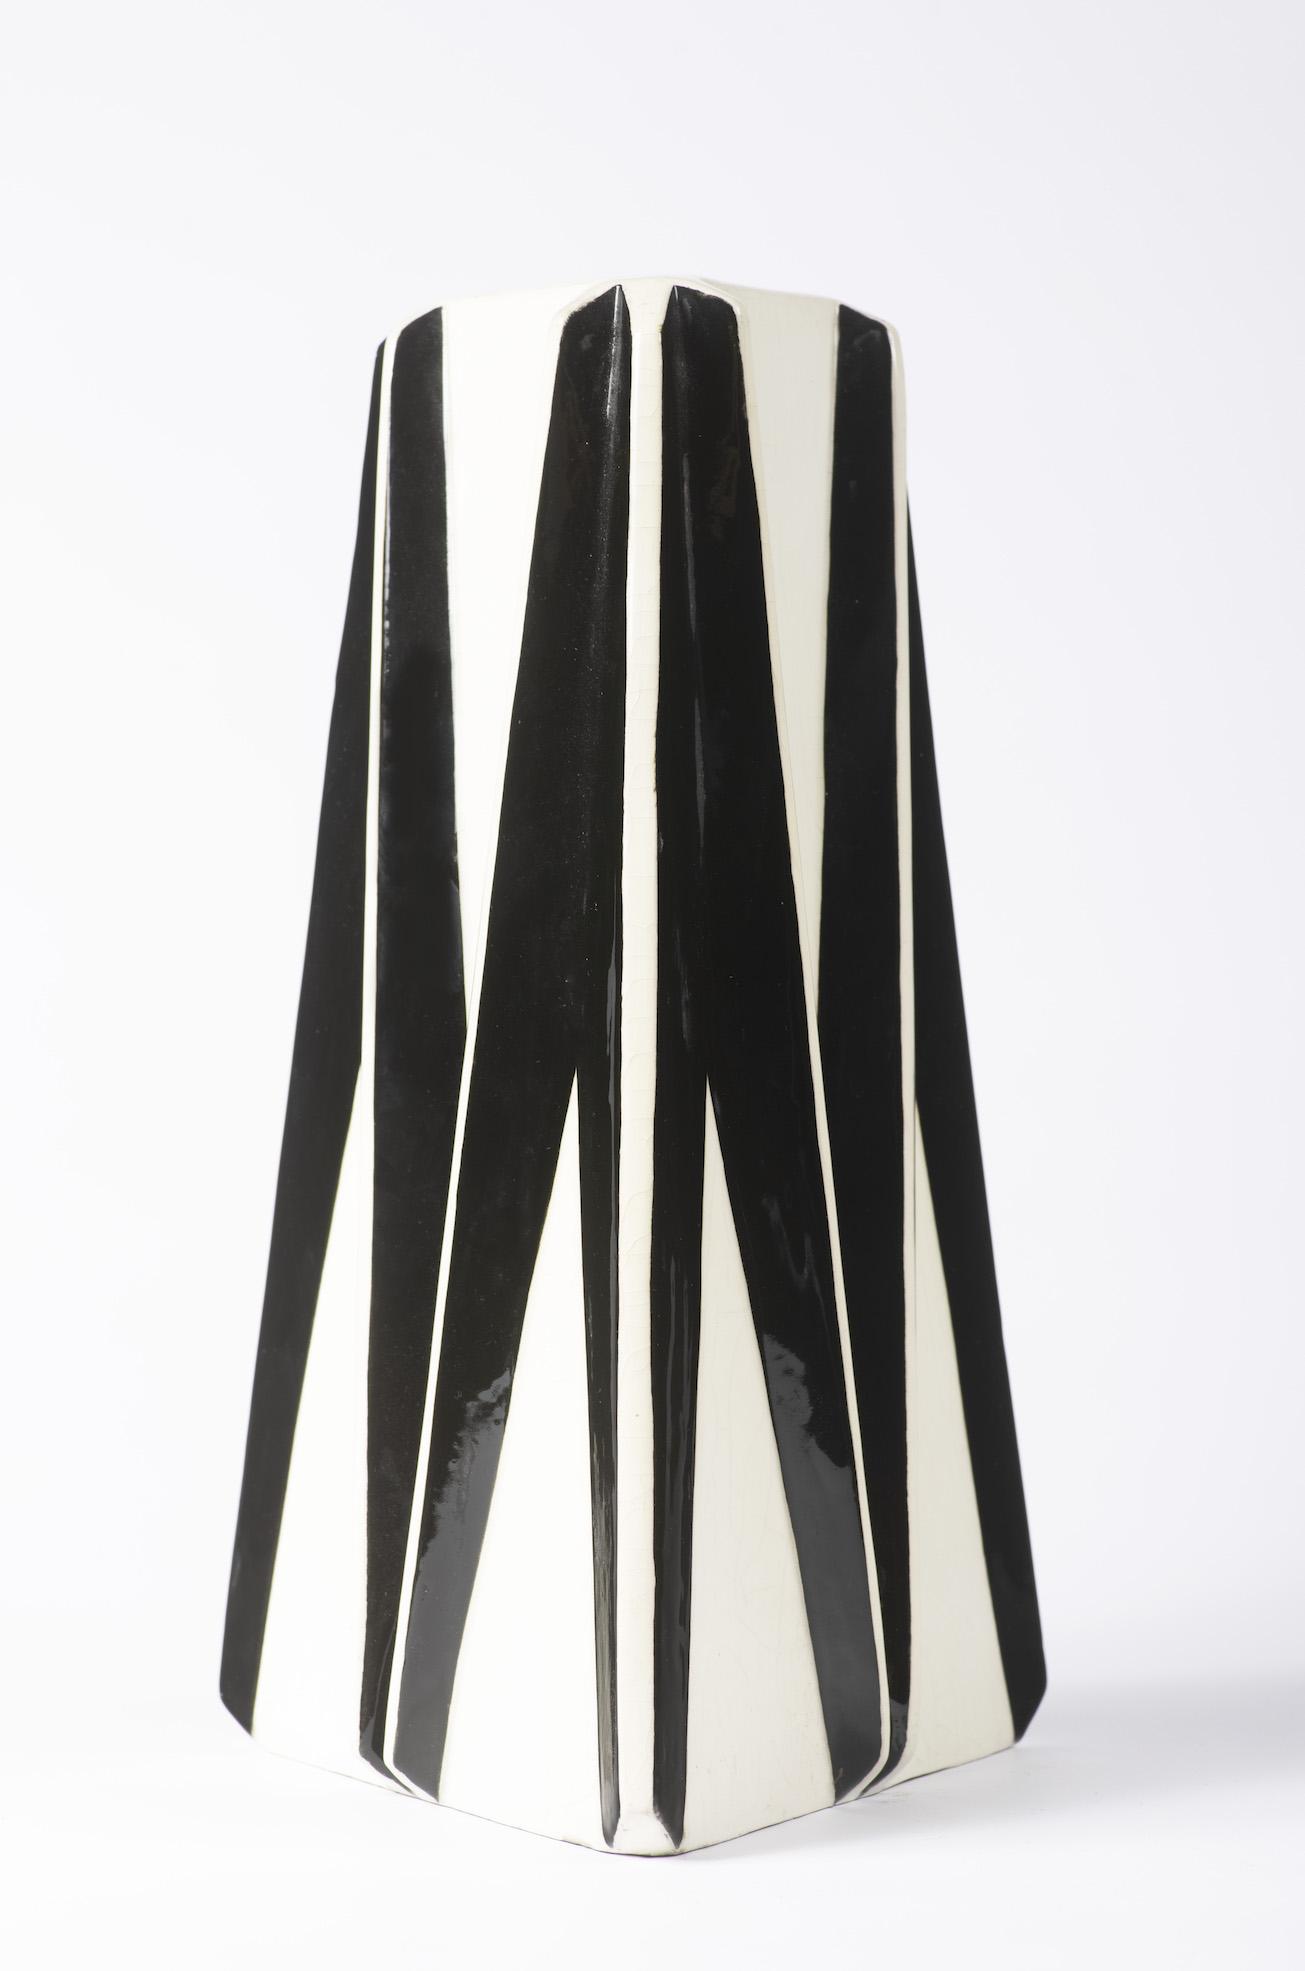 kubisticka vaza hofman aukce